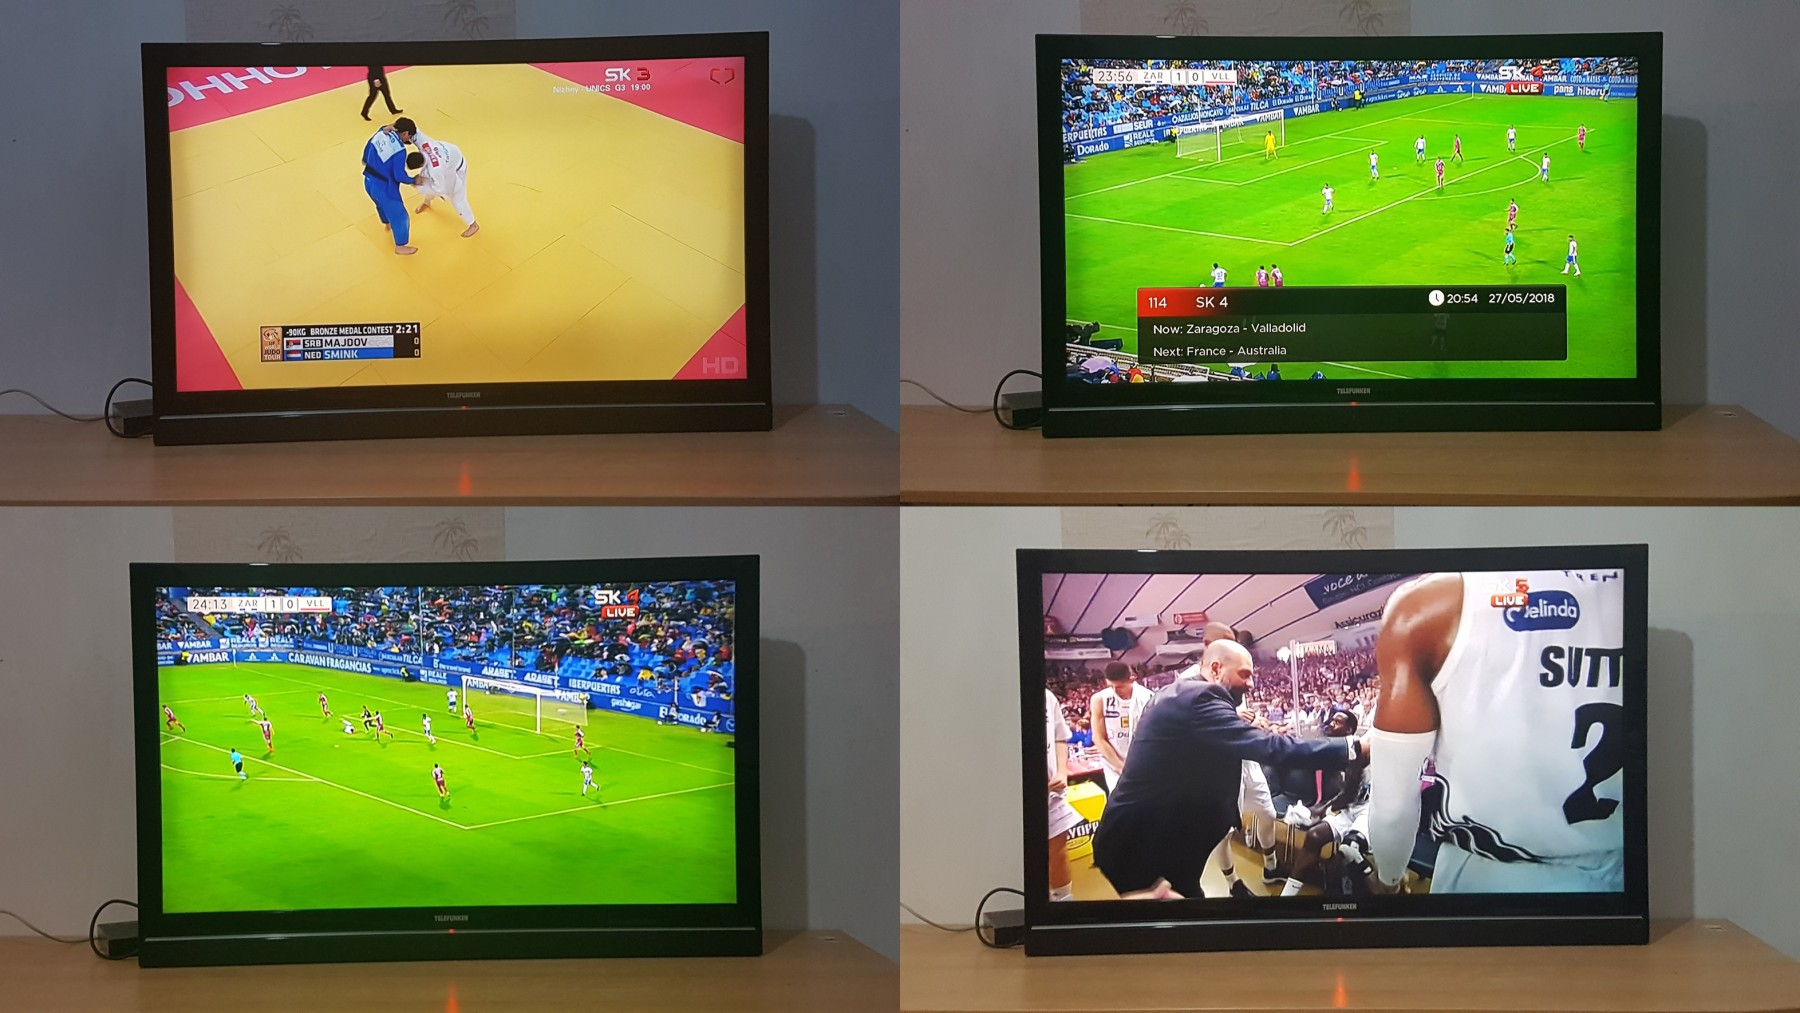 4 LCD tv TELEFUNKEN 42 inca FULL HD,hdmi,USB (66750457) - Limundo com